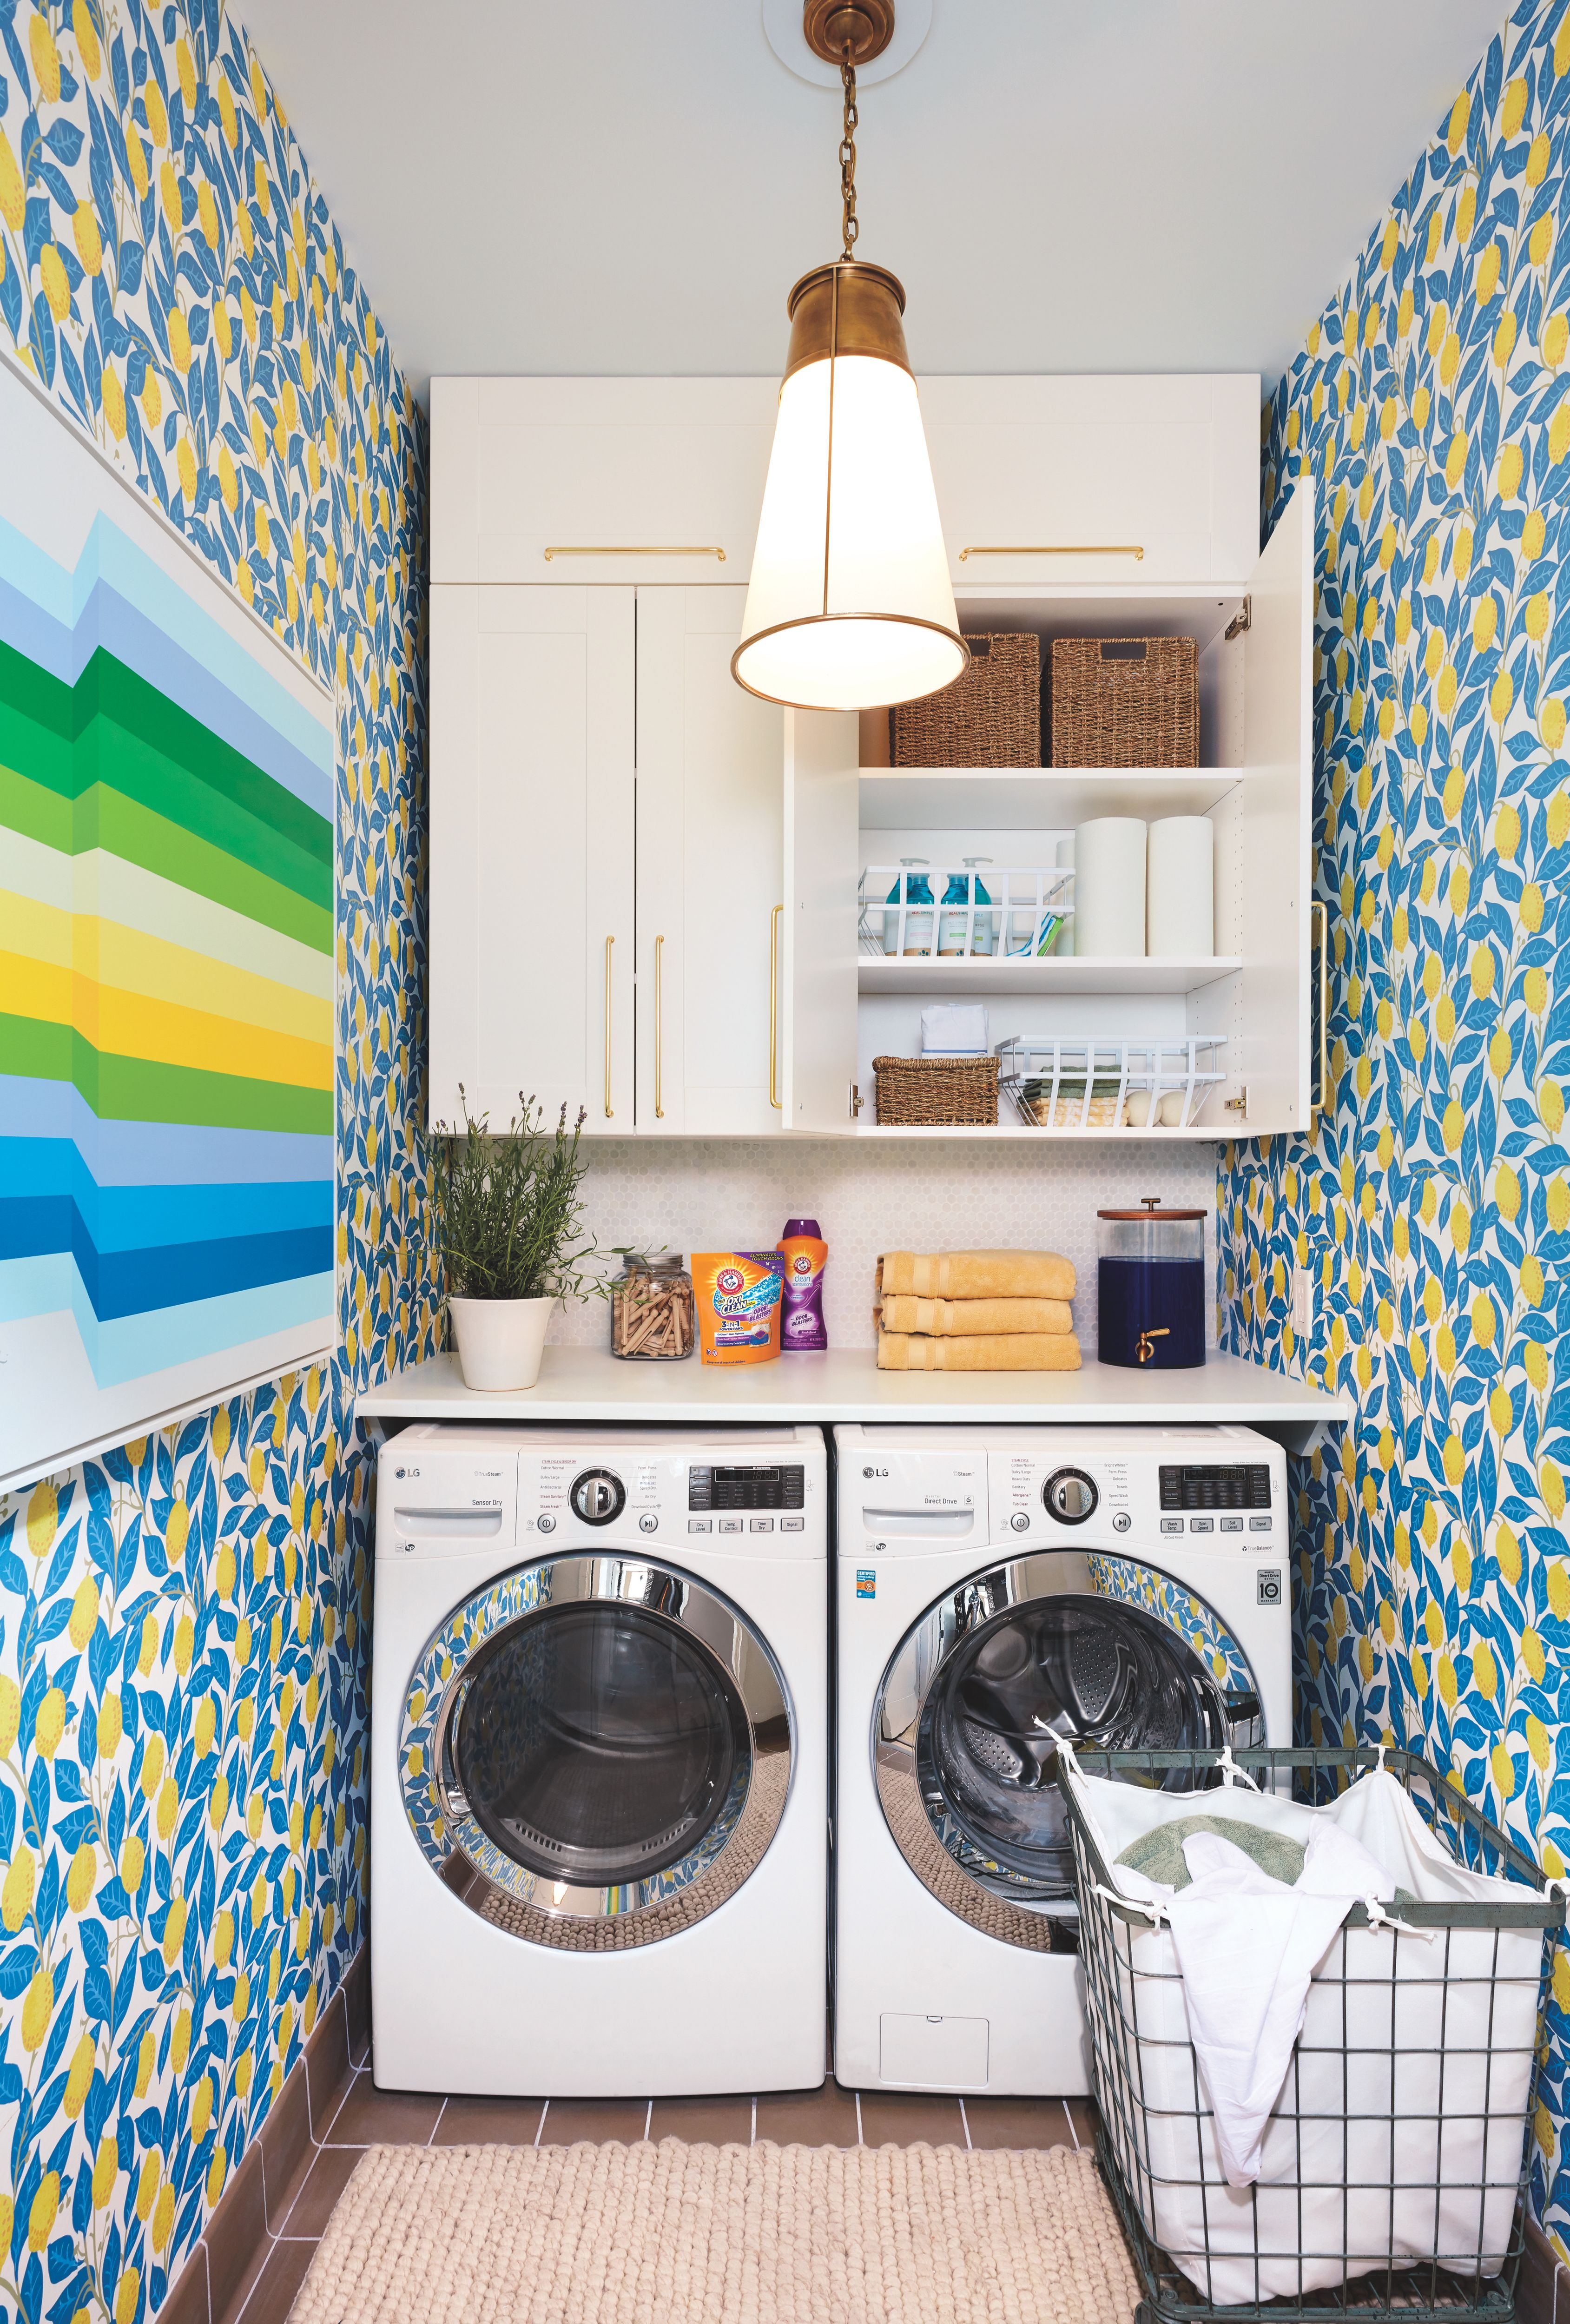 Theneatlife Simplify Livesimply Organized Declutter Luxurydesign Lifestyles Homeorganizer Laundry Room Design Small Laundry Rooms Laundry Room Cabinets